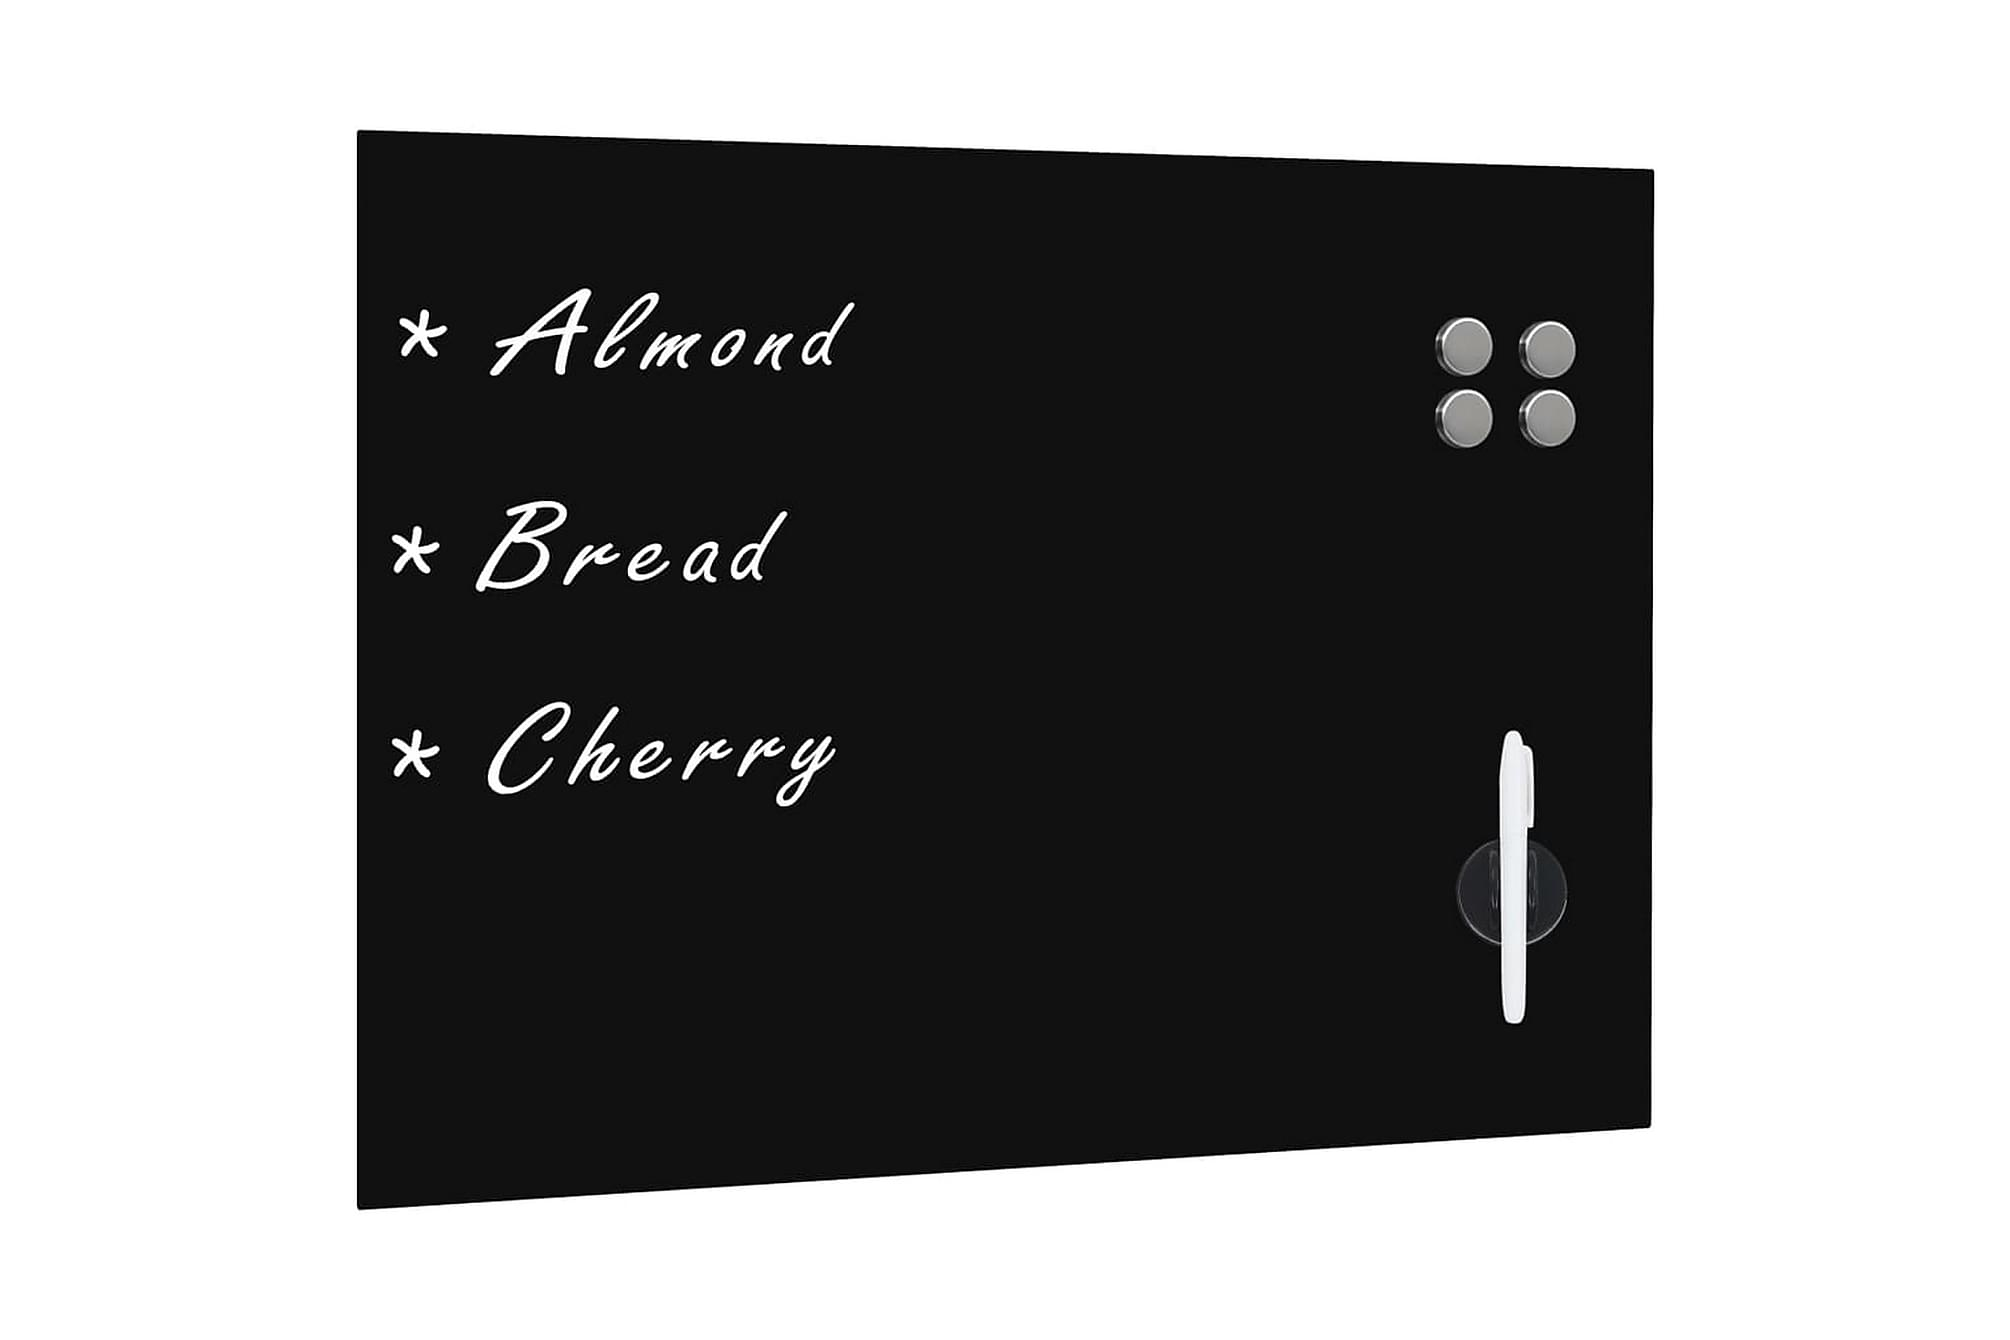 Svarta tavlan magnetisk väggmonterad glas 80x60 cm, Whiteboards & griffeltavlor